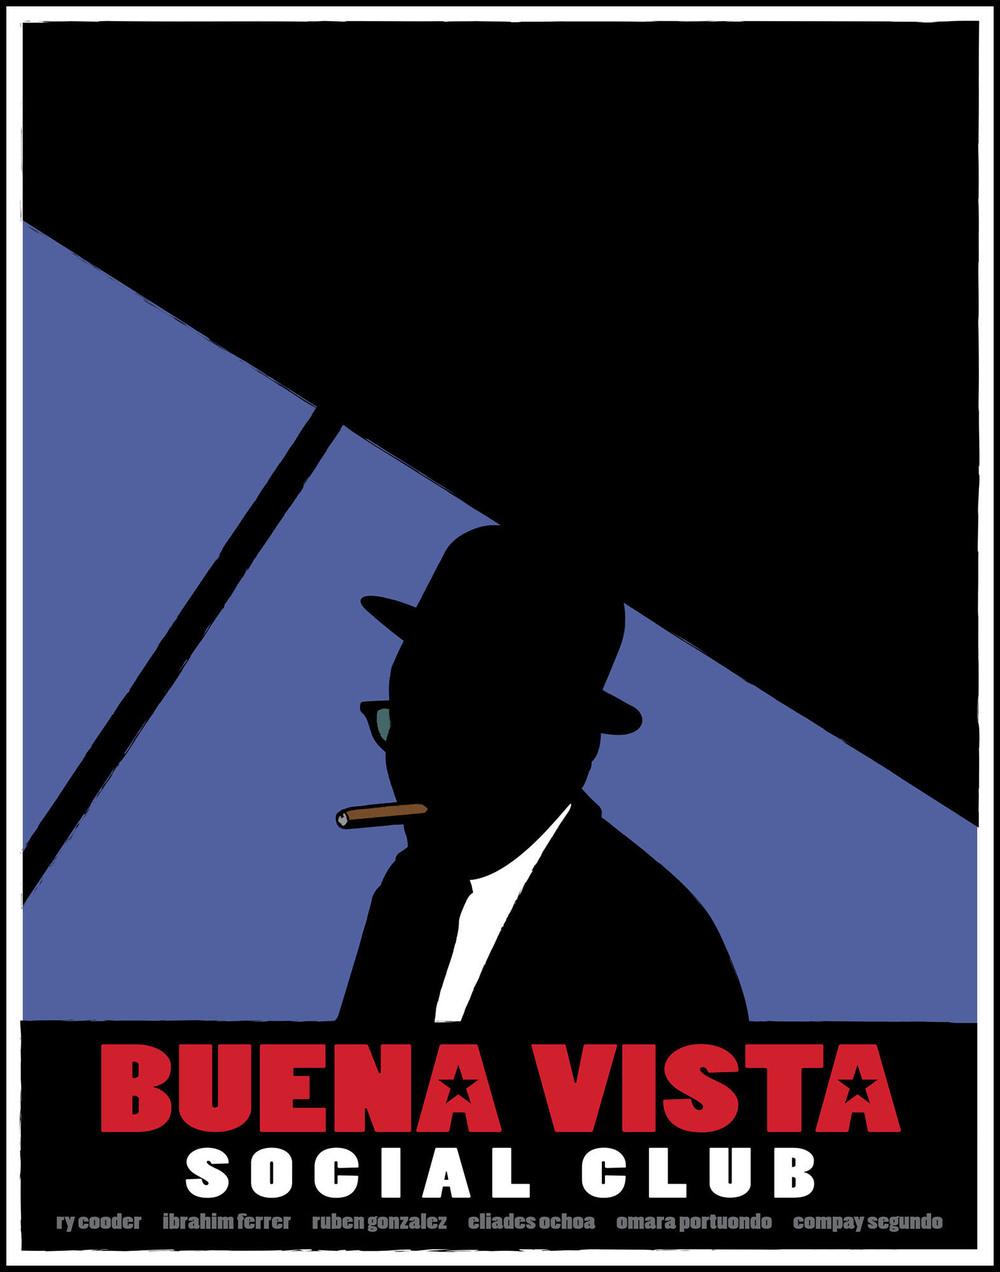 Buena Vista Social Club_11 x 14.jpg